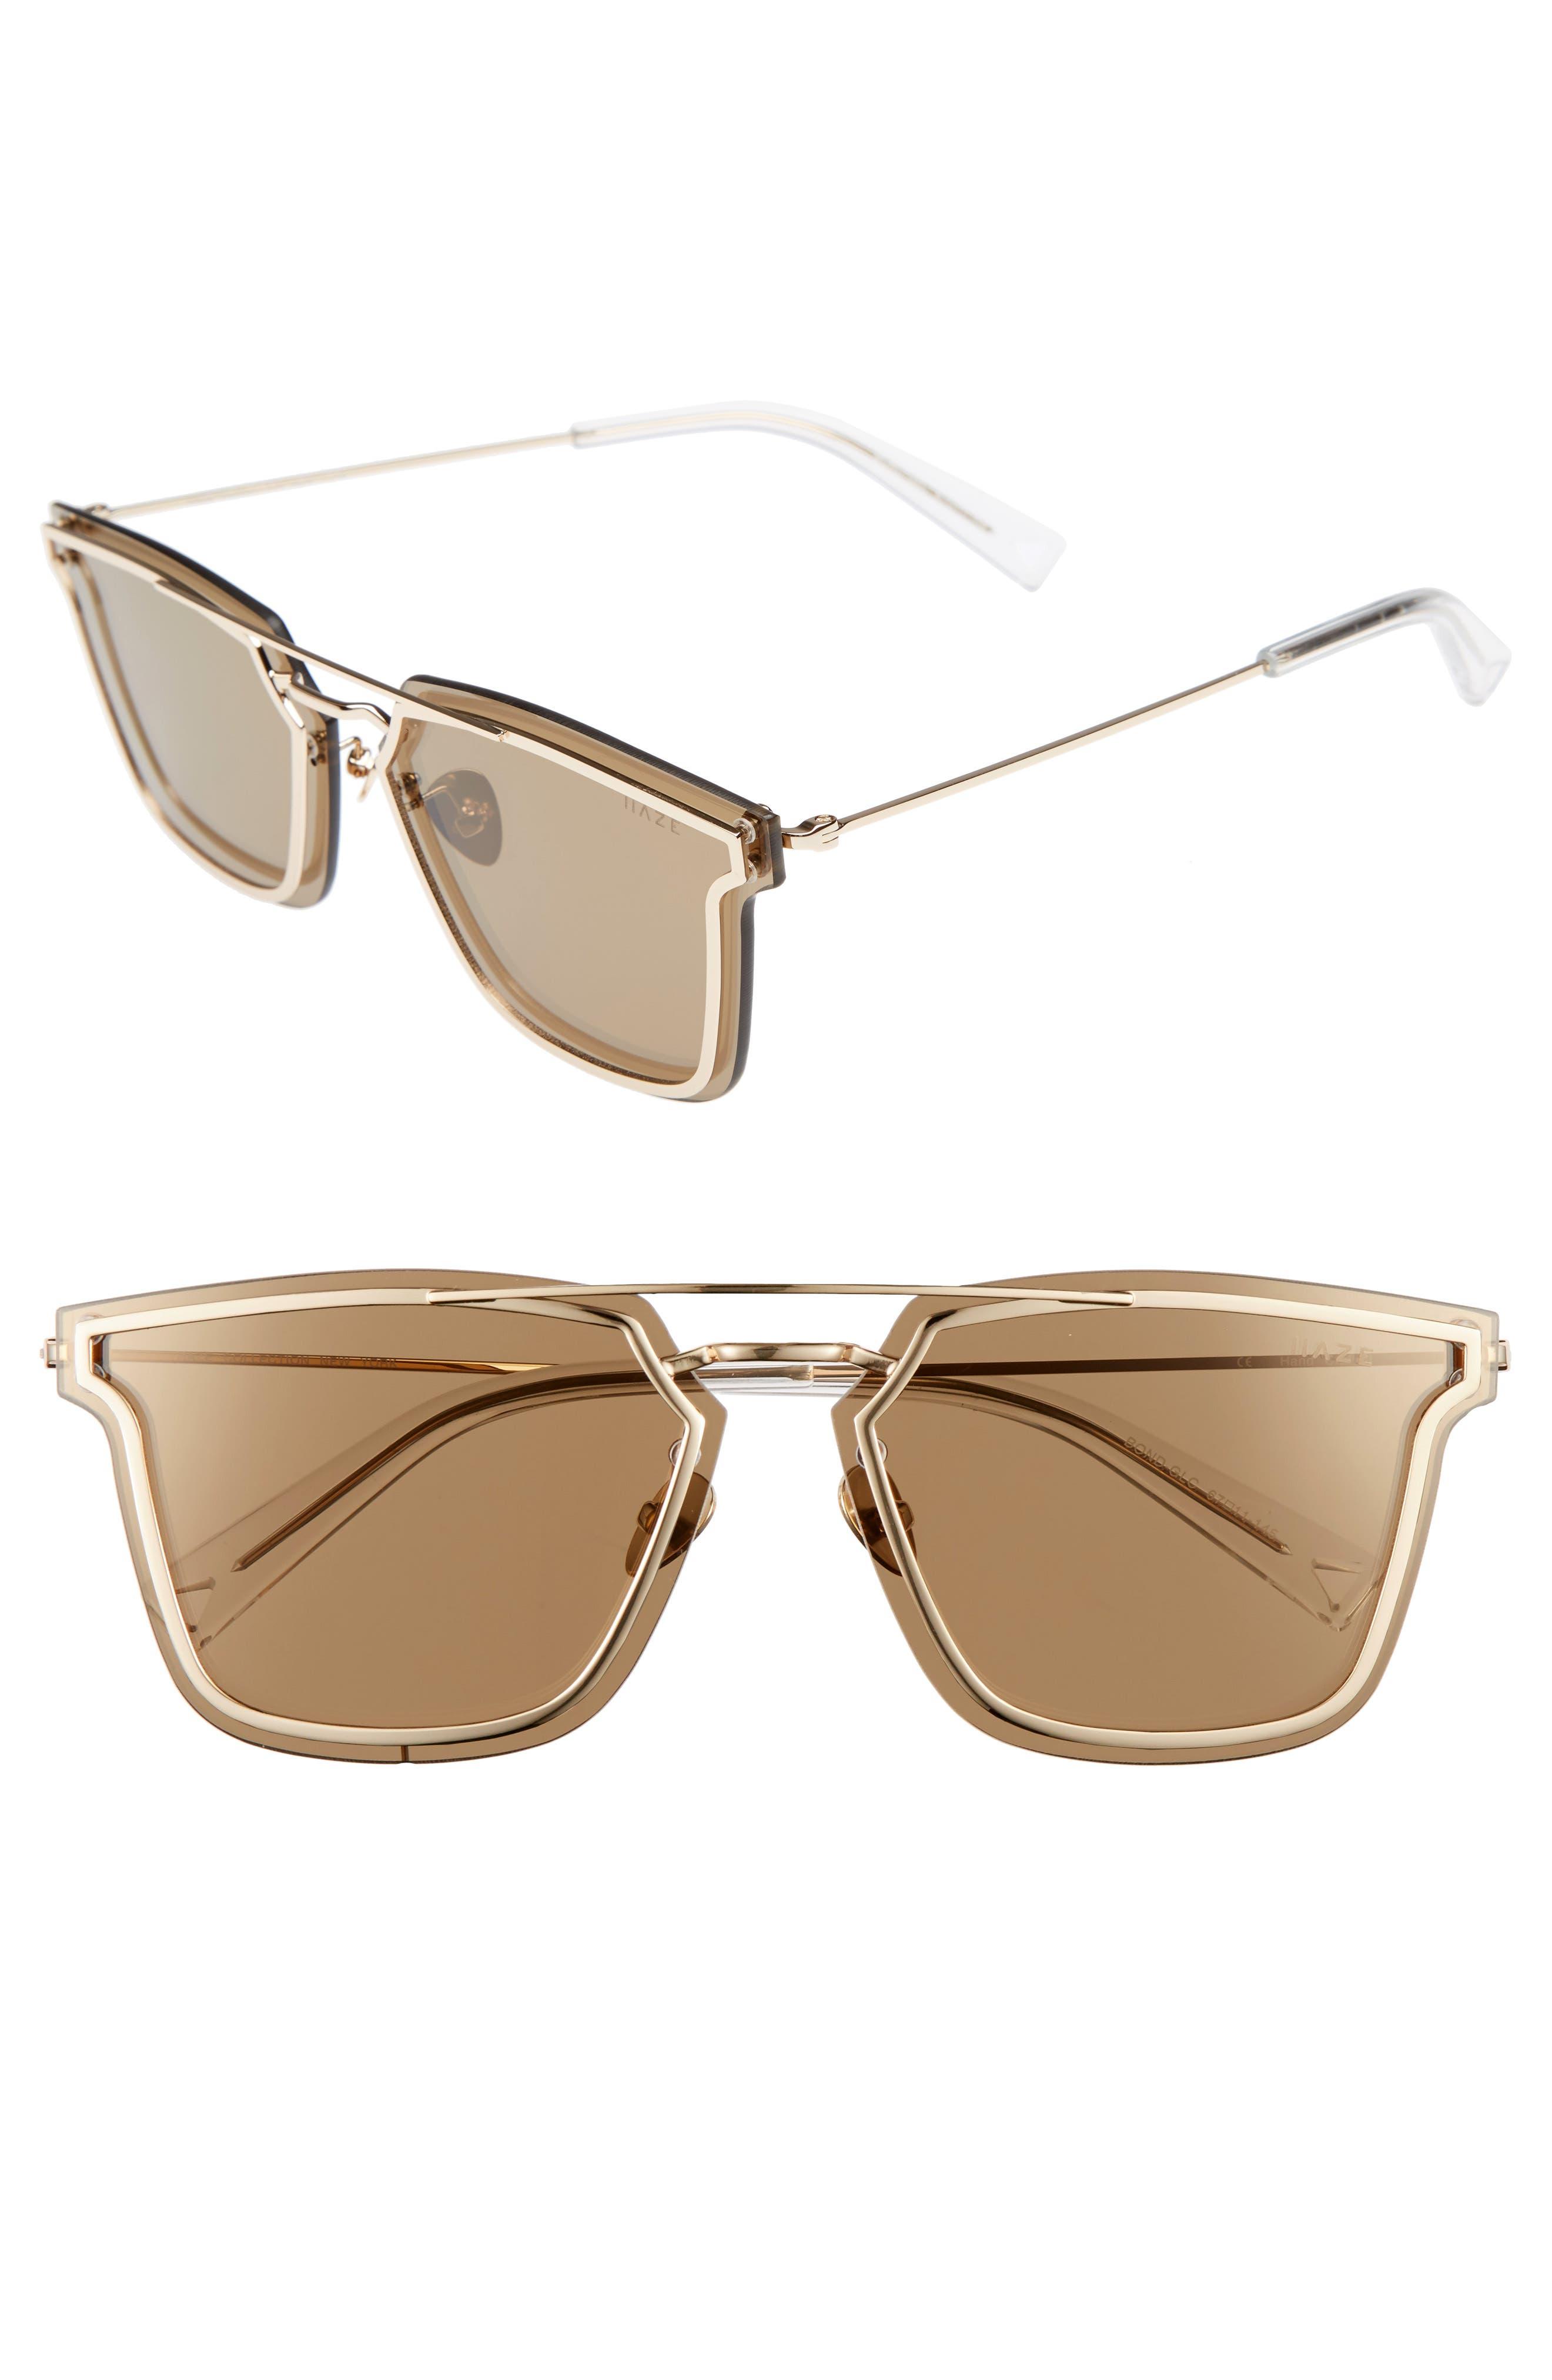 Main Image - HAZE Bond 67mm Oversize Mirrored Sunglasses